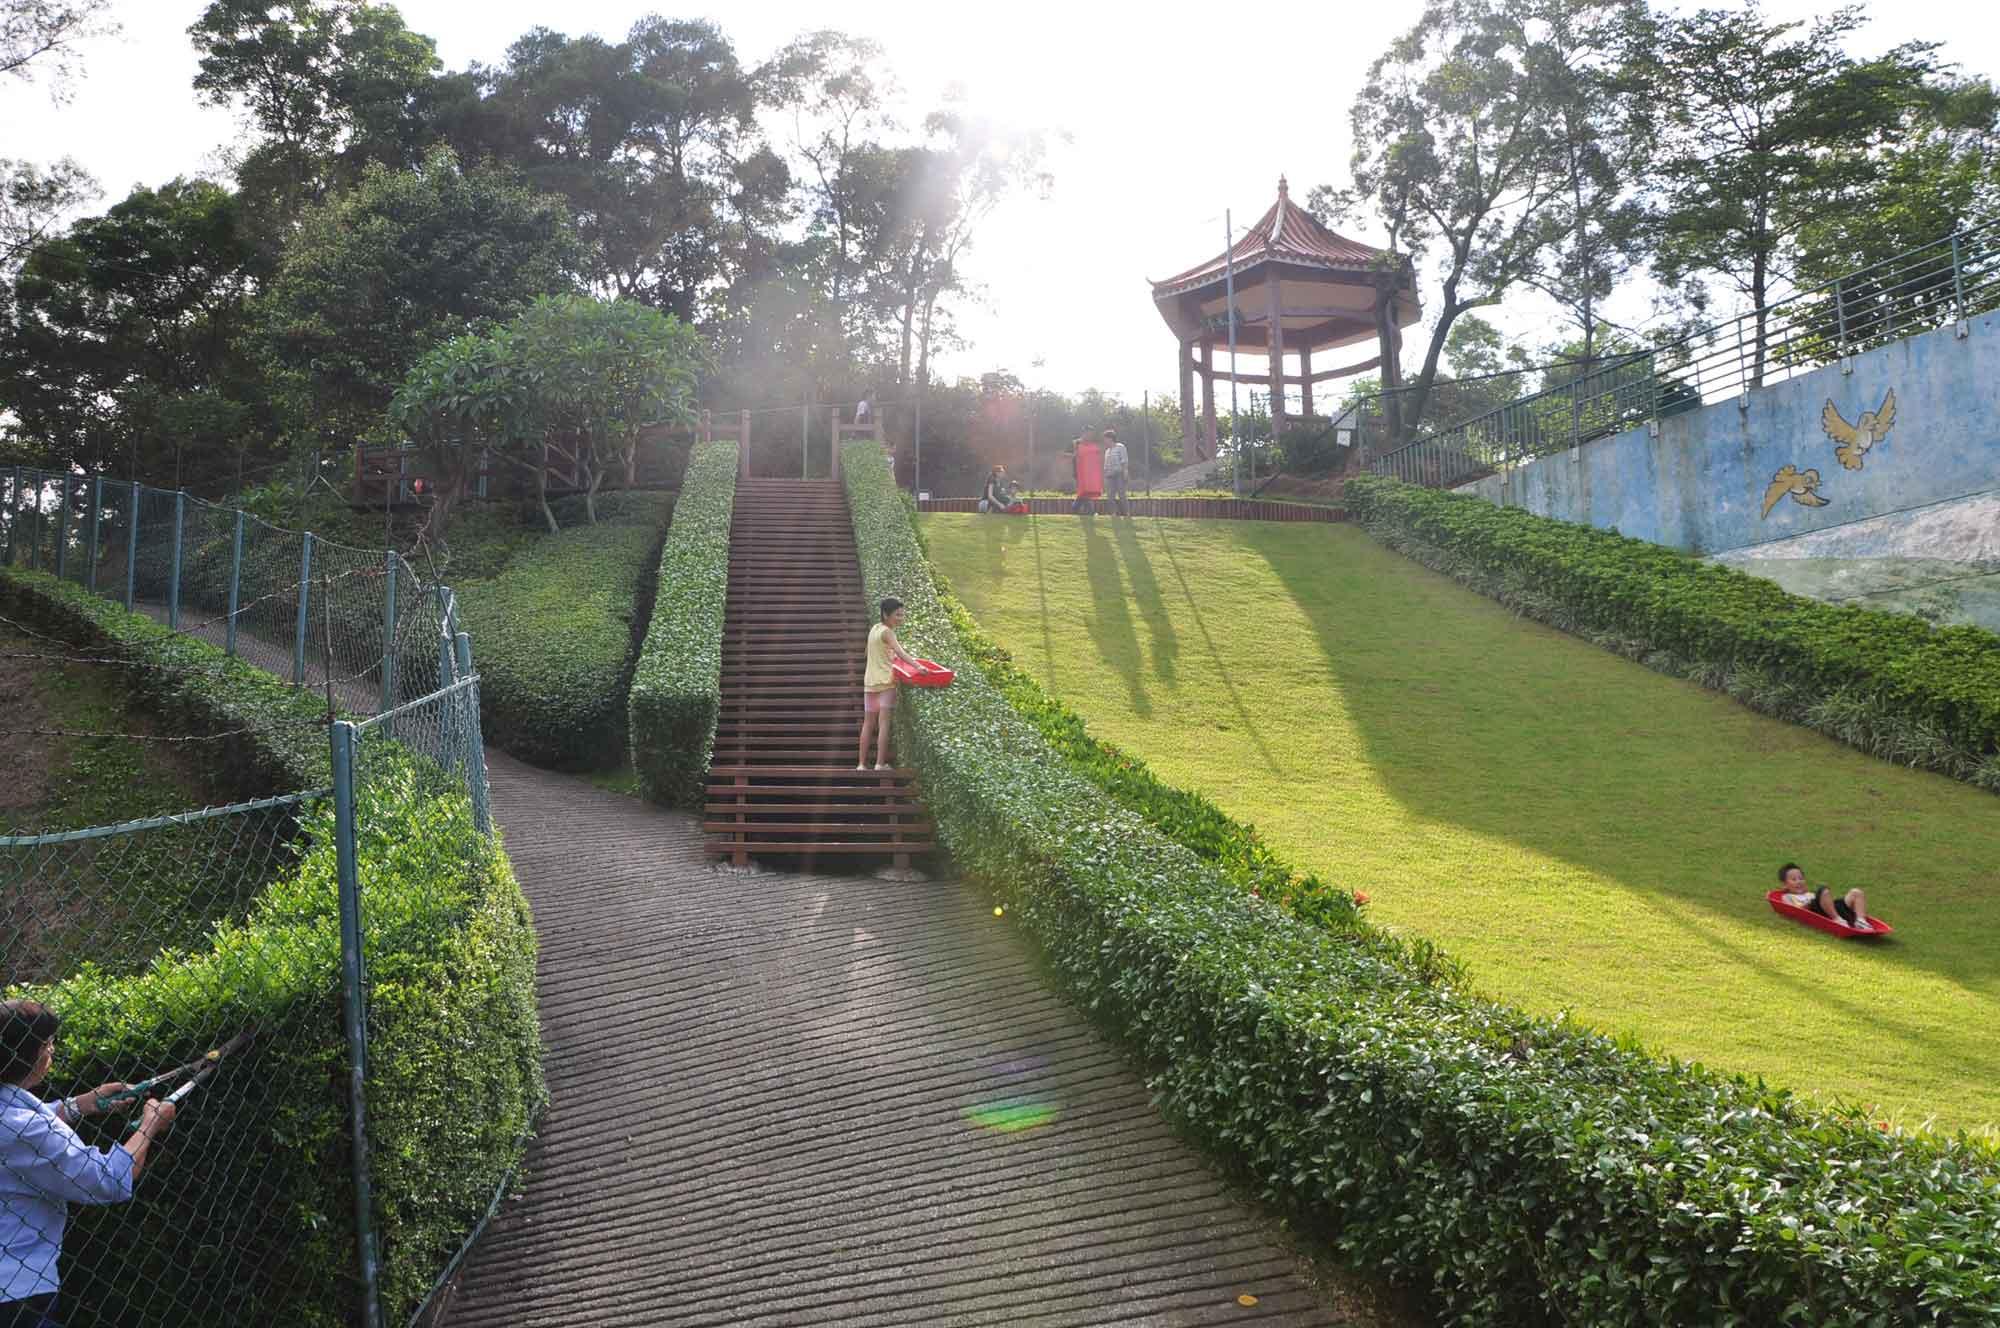 Macau Parks: Hac Sa Reservoir BBQ Park